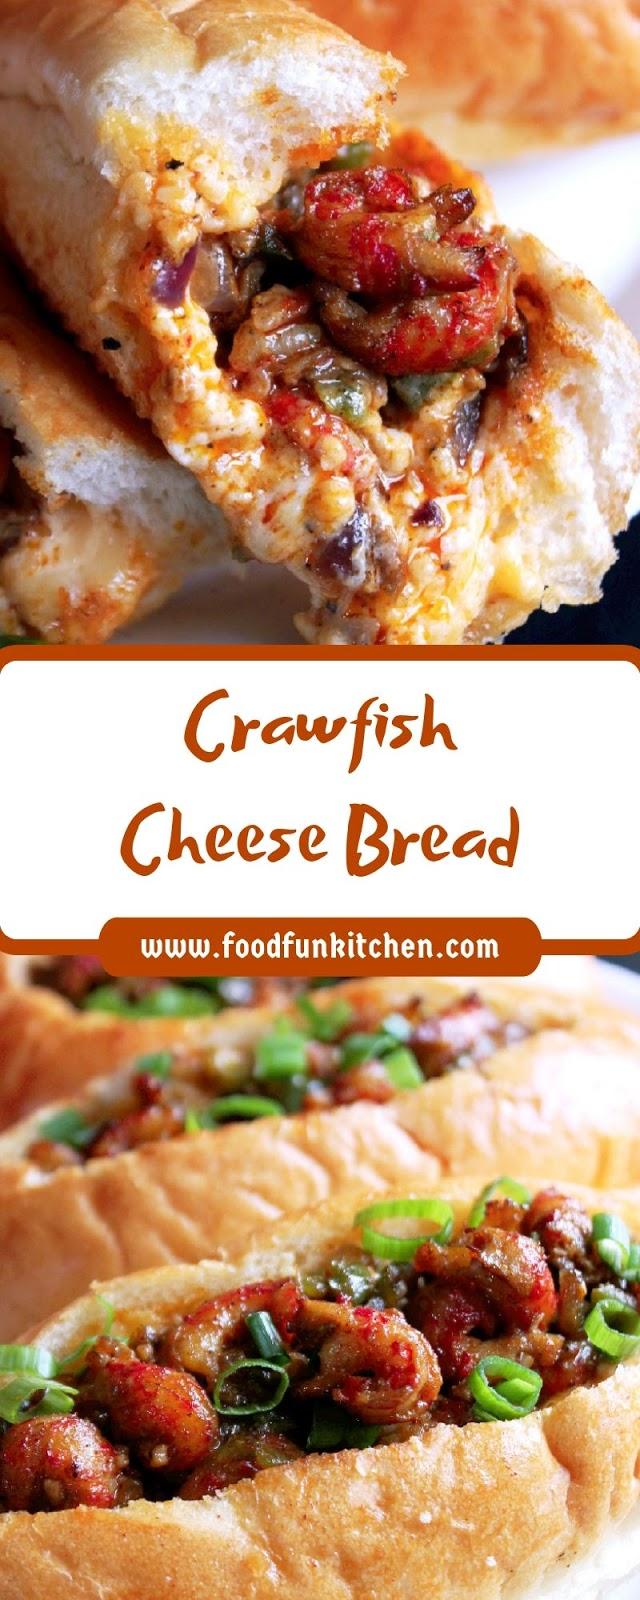 Crawfish Cheese Bread